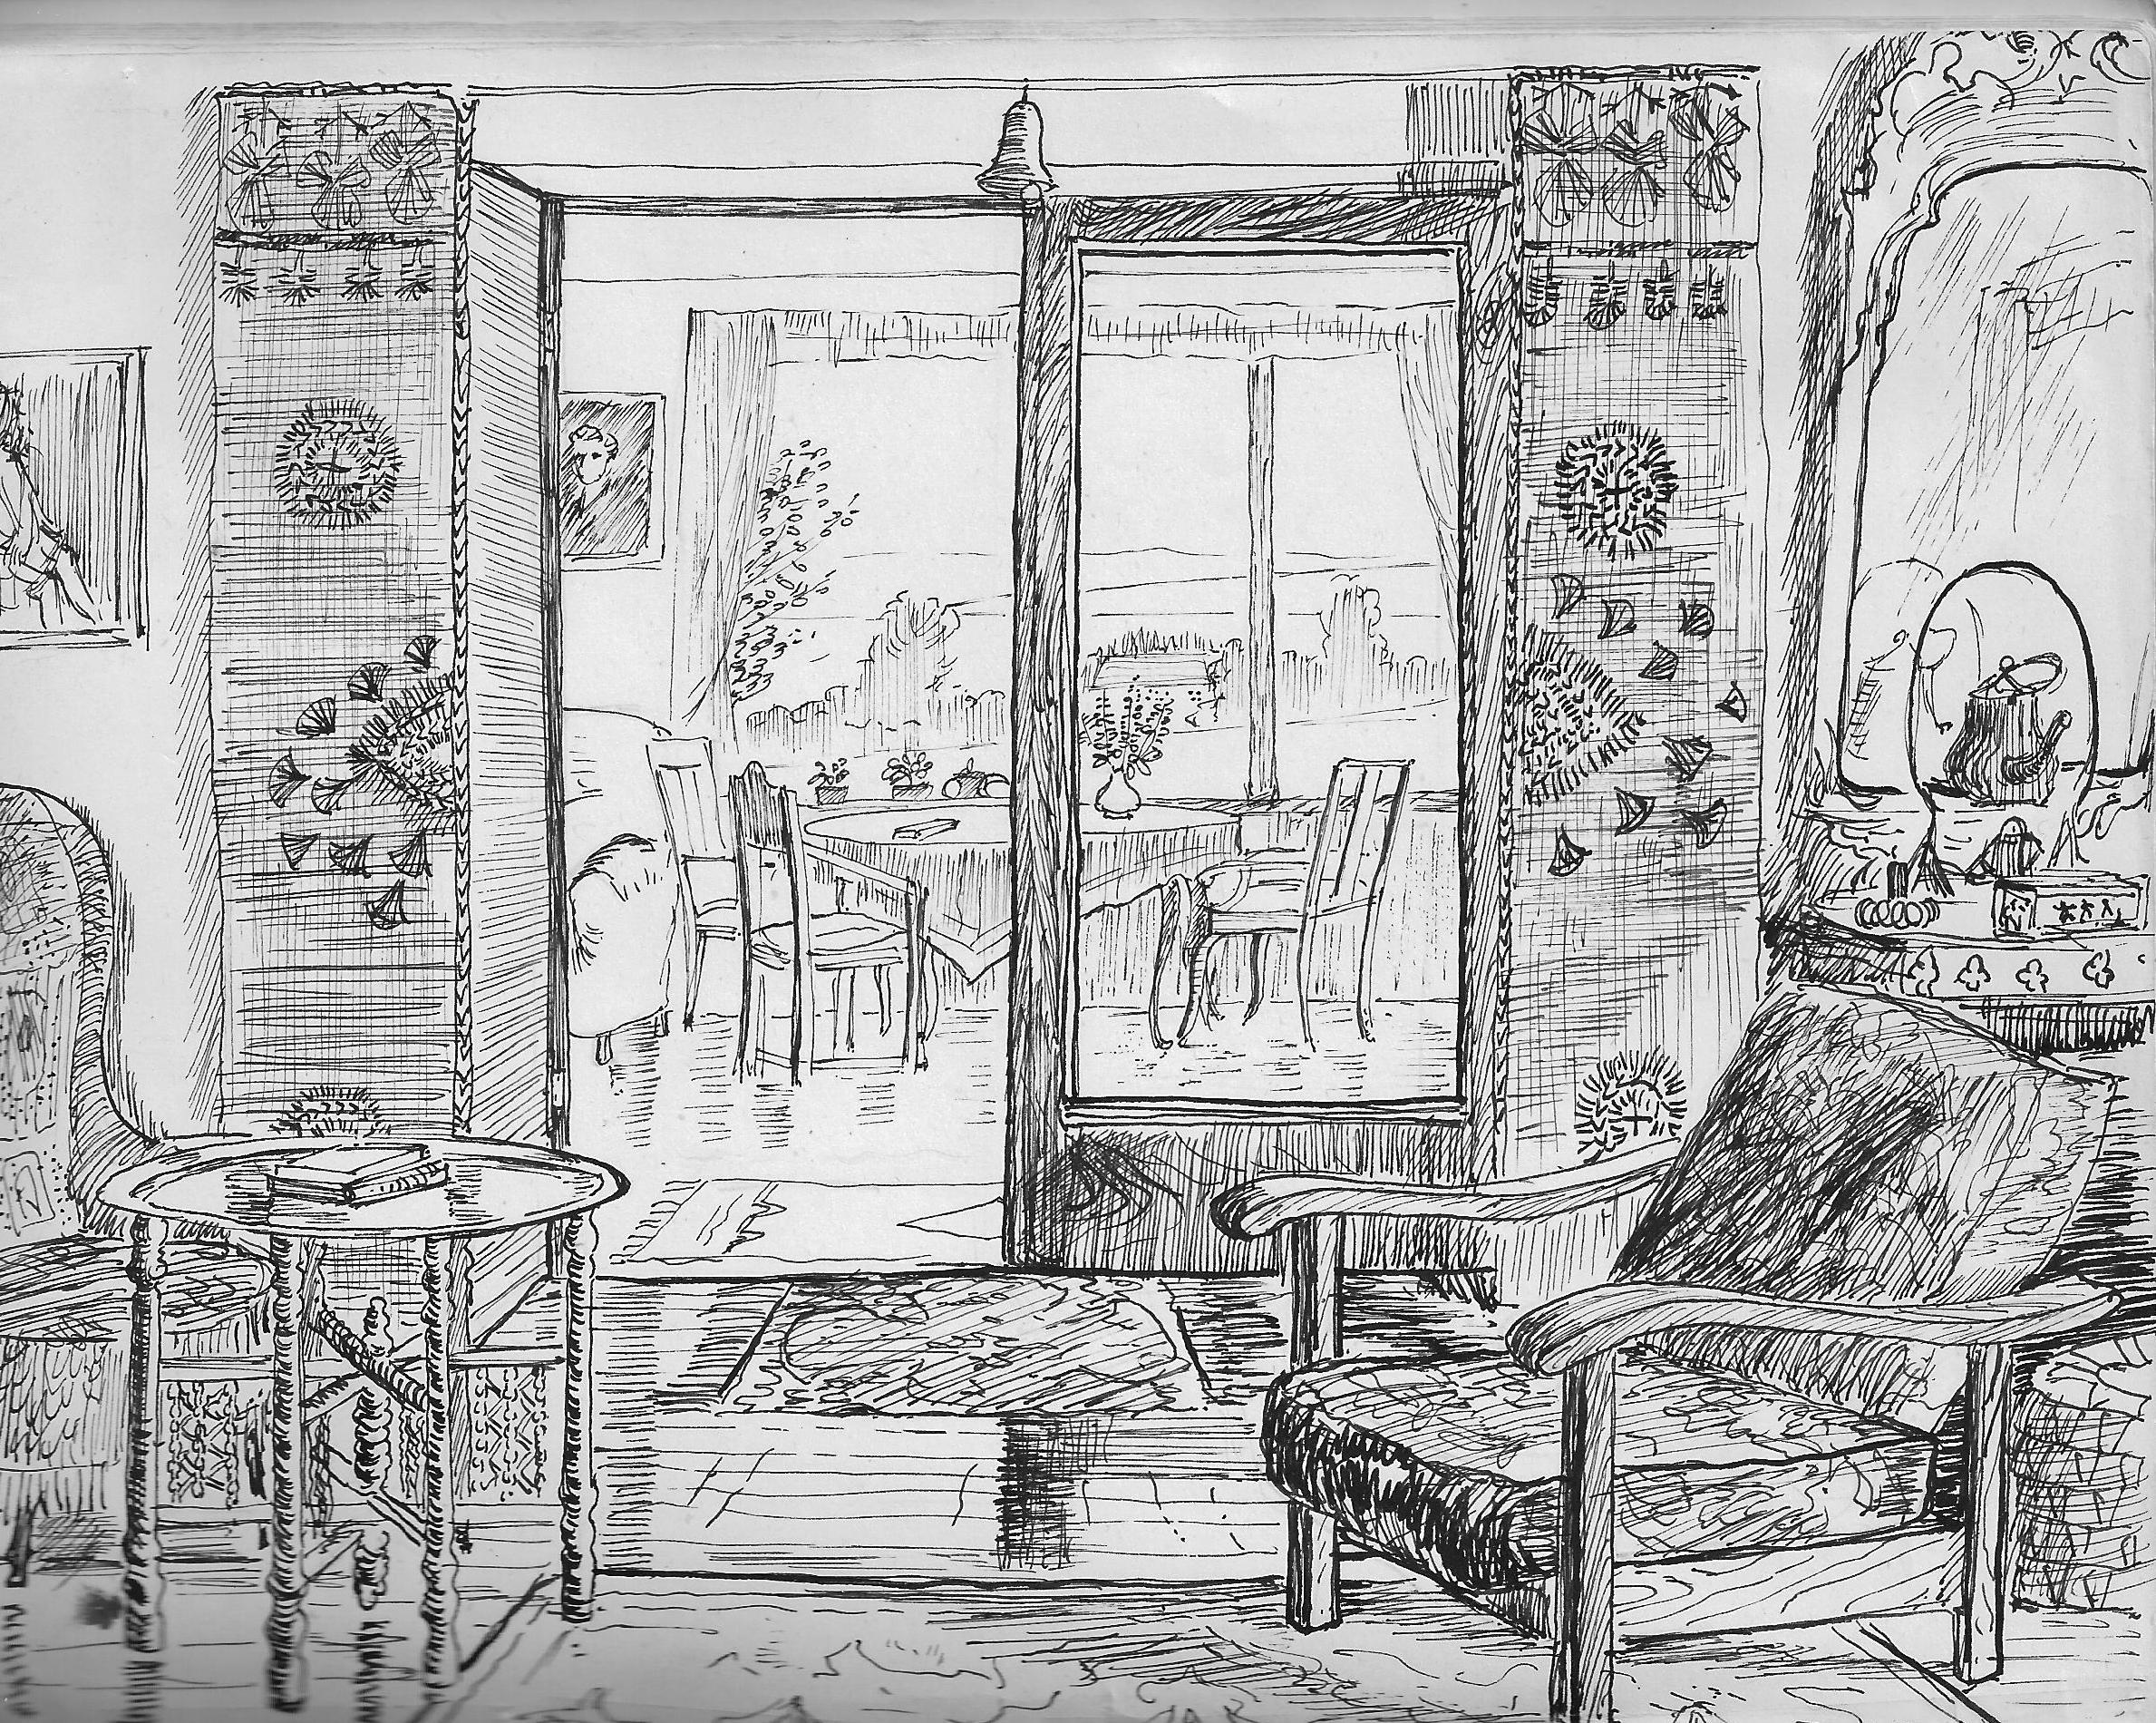 Aunt Dorothy's home, Isle of Helgoya, Norway